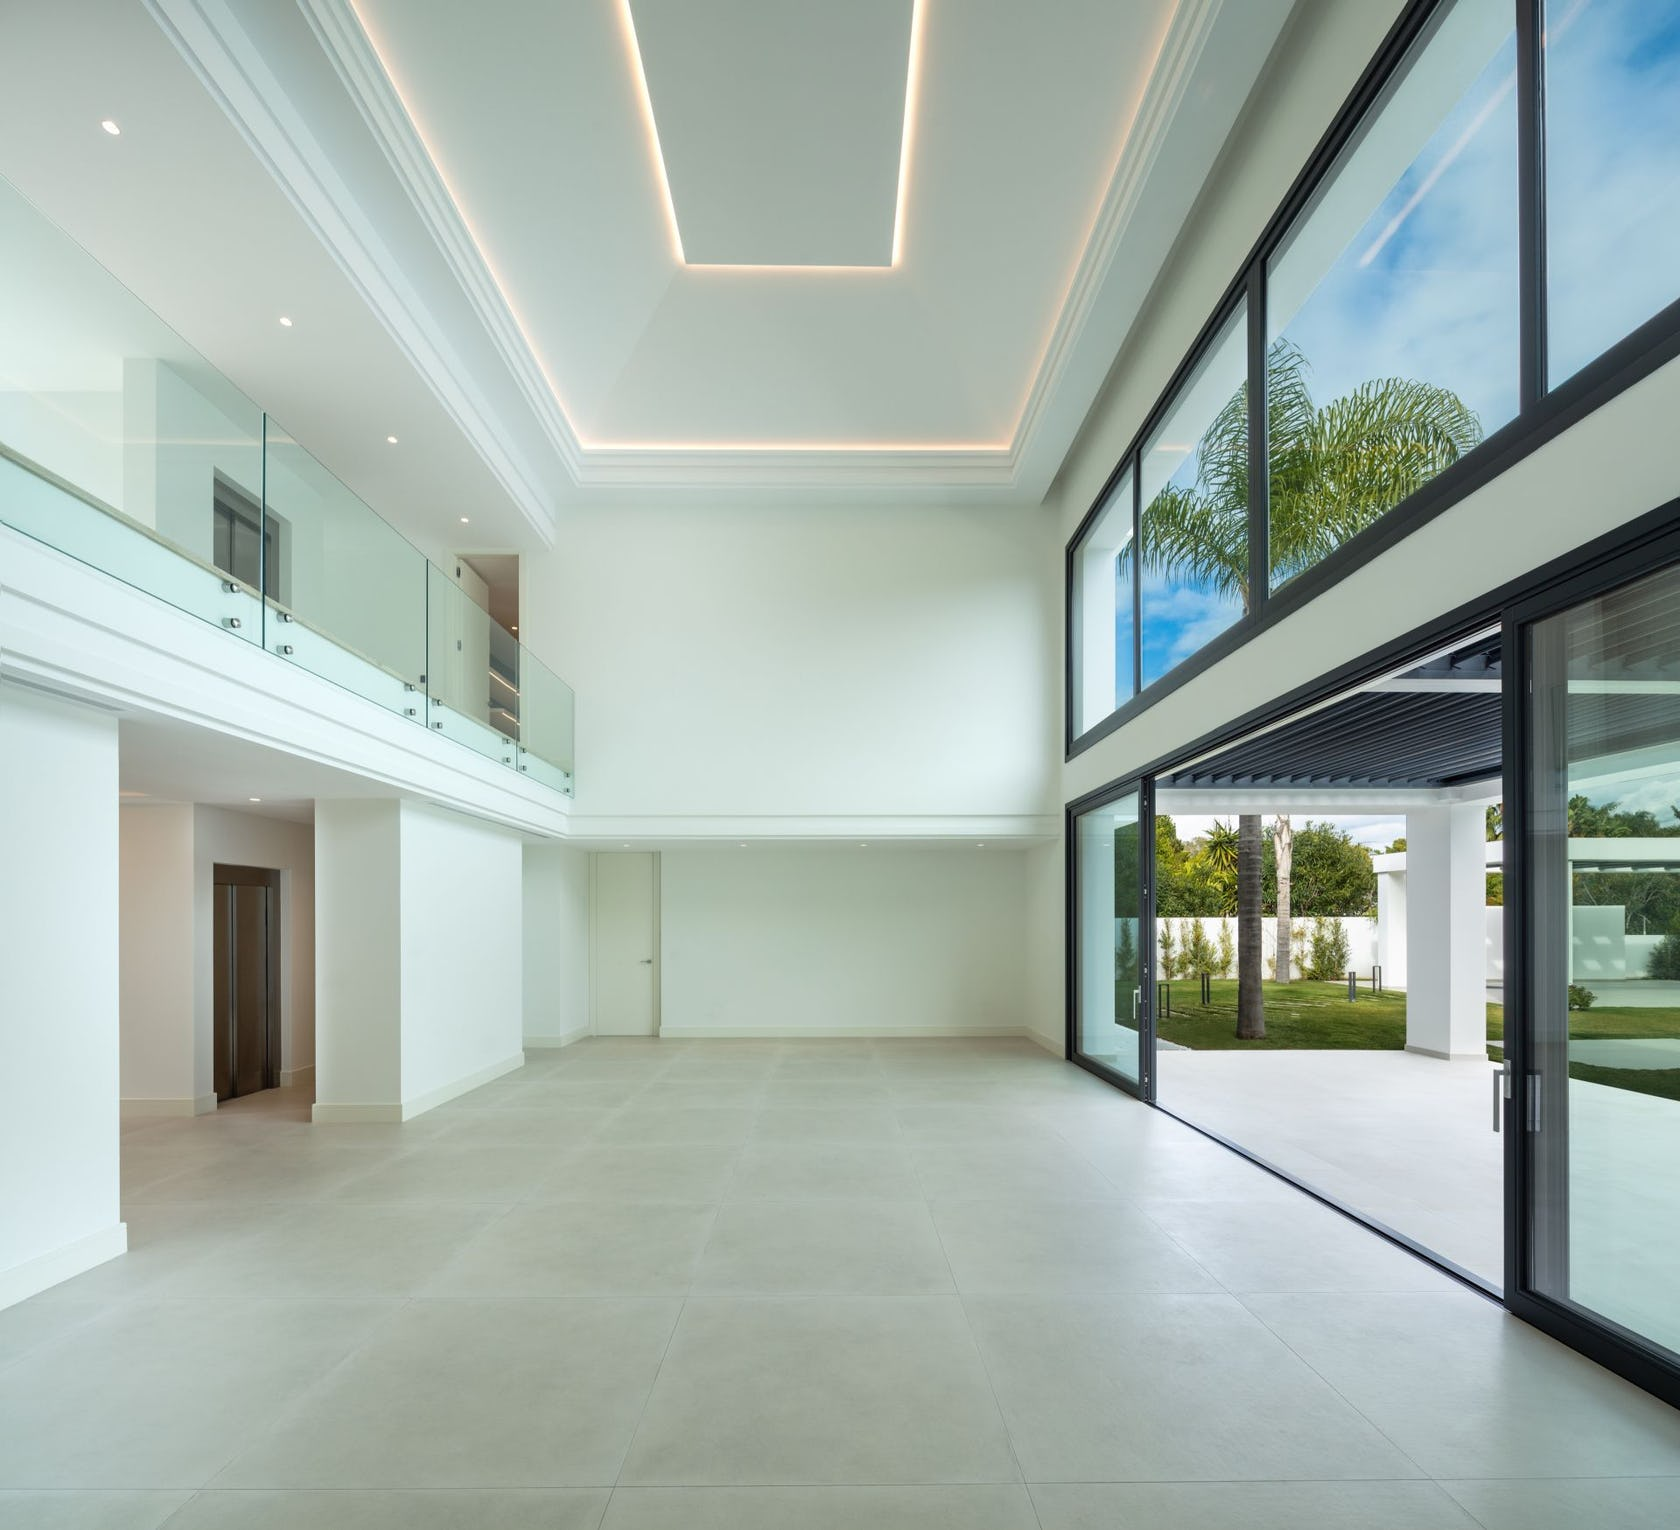 floor flooring lobby indoors room